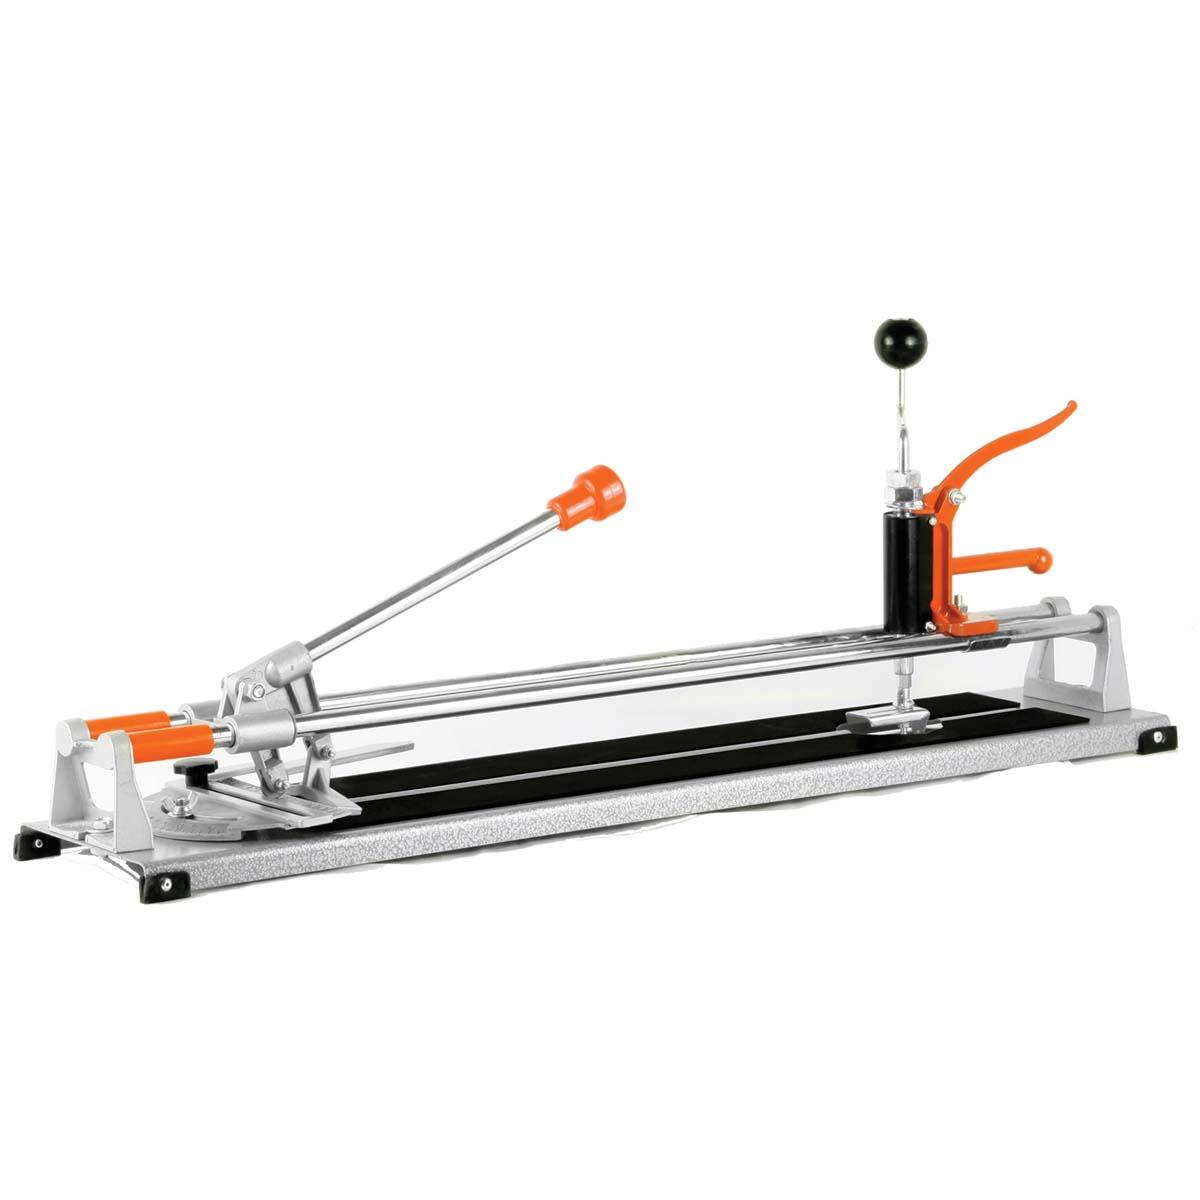 Tile Cutter 3 Function 400mm